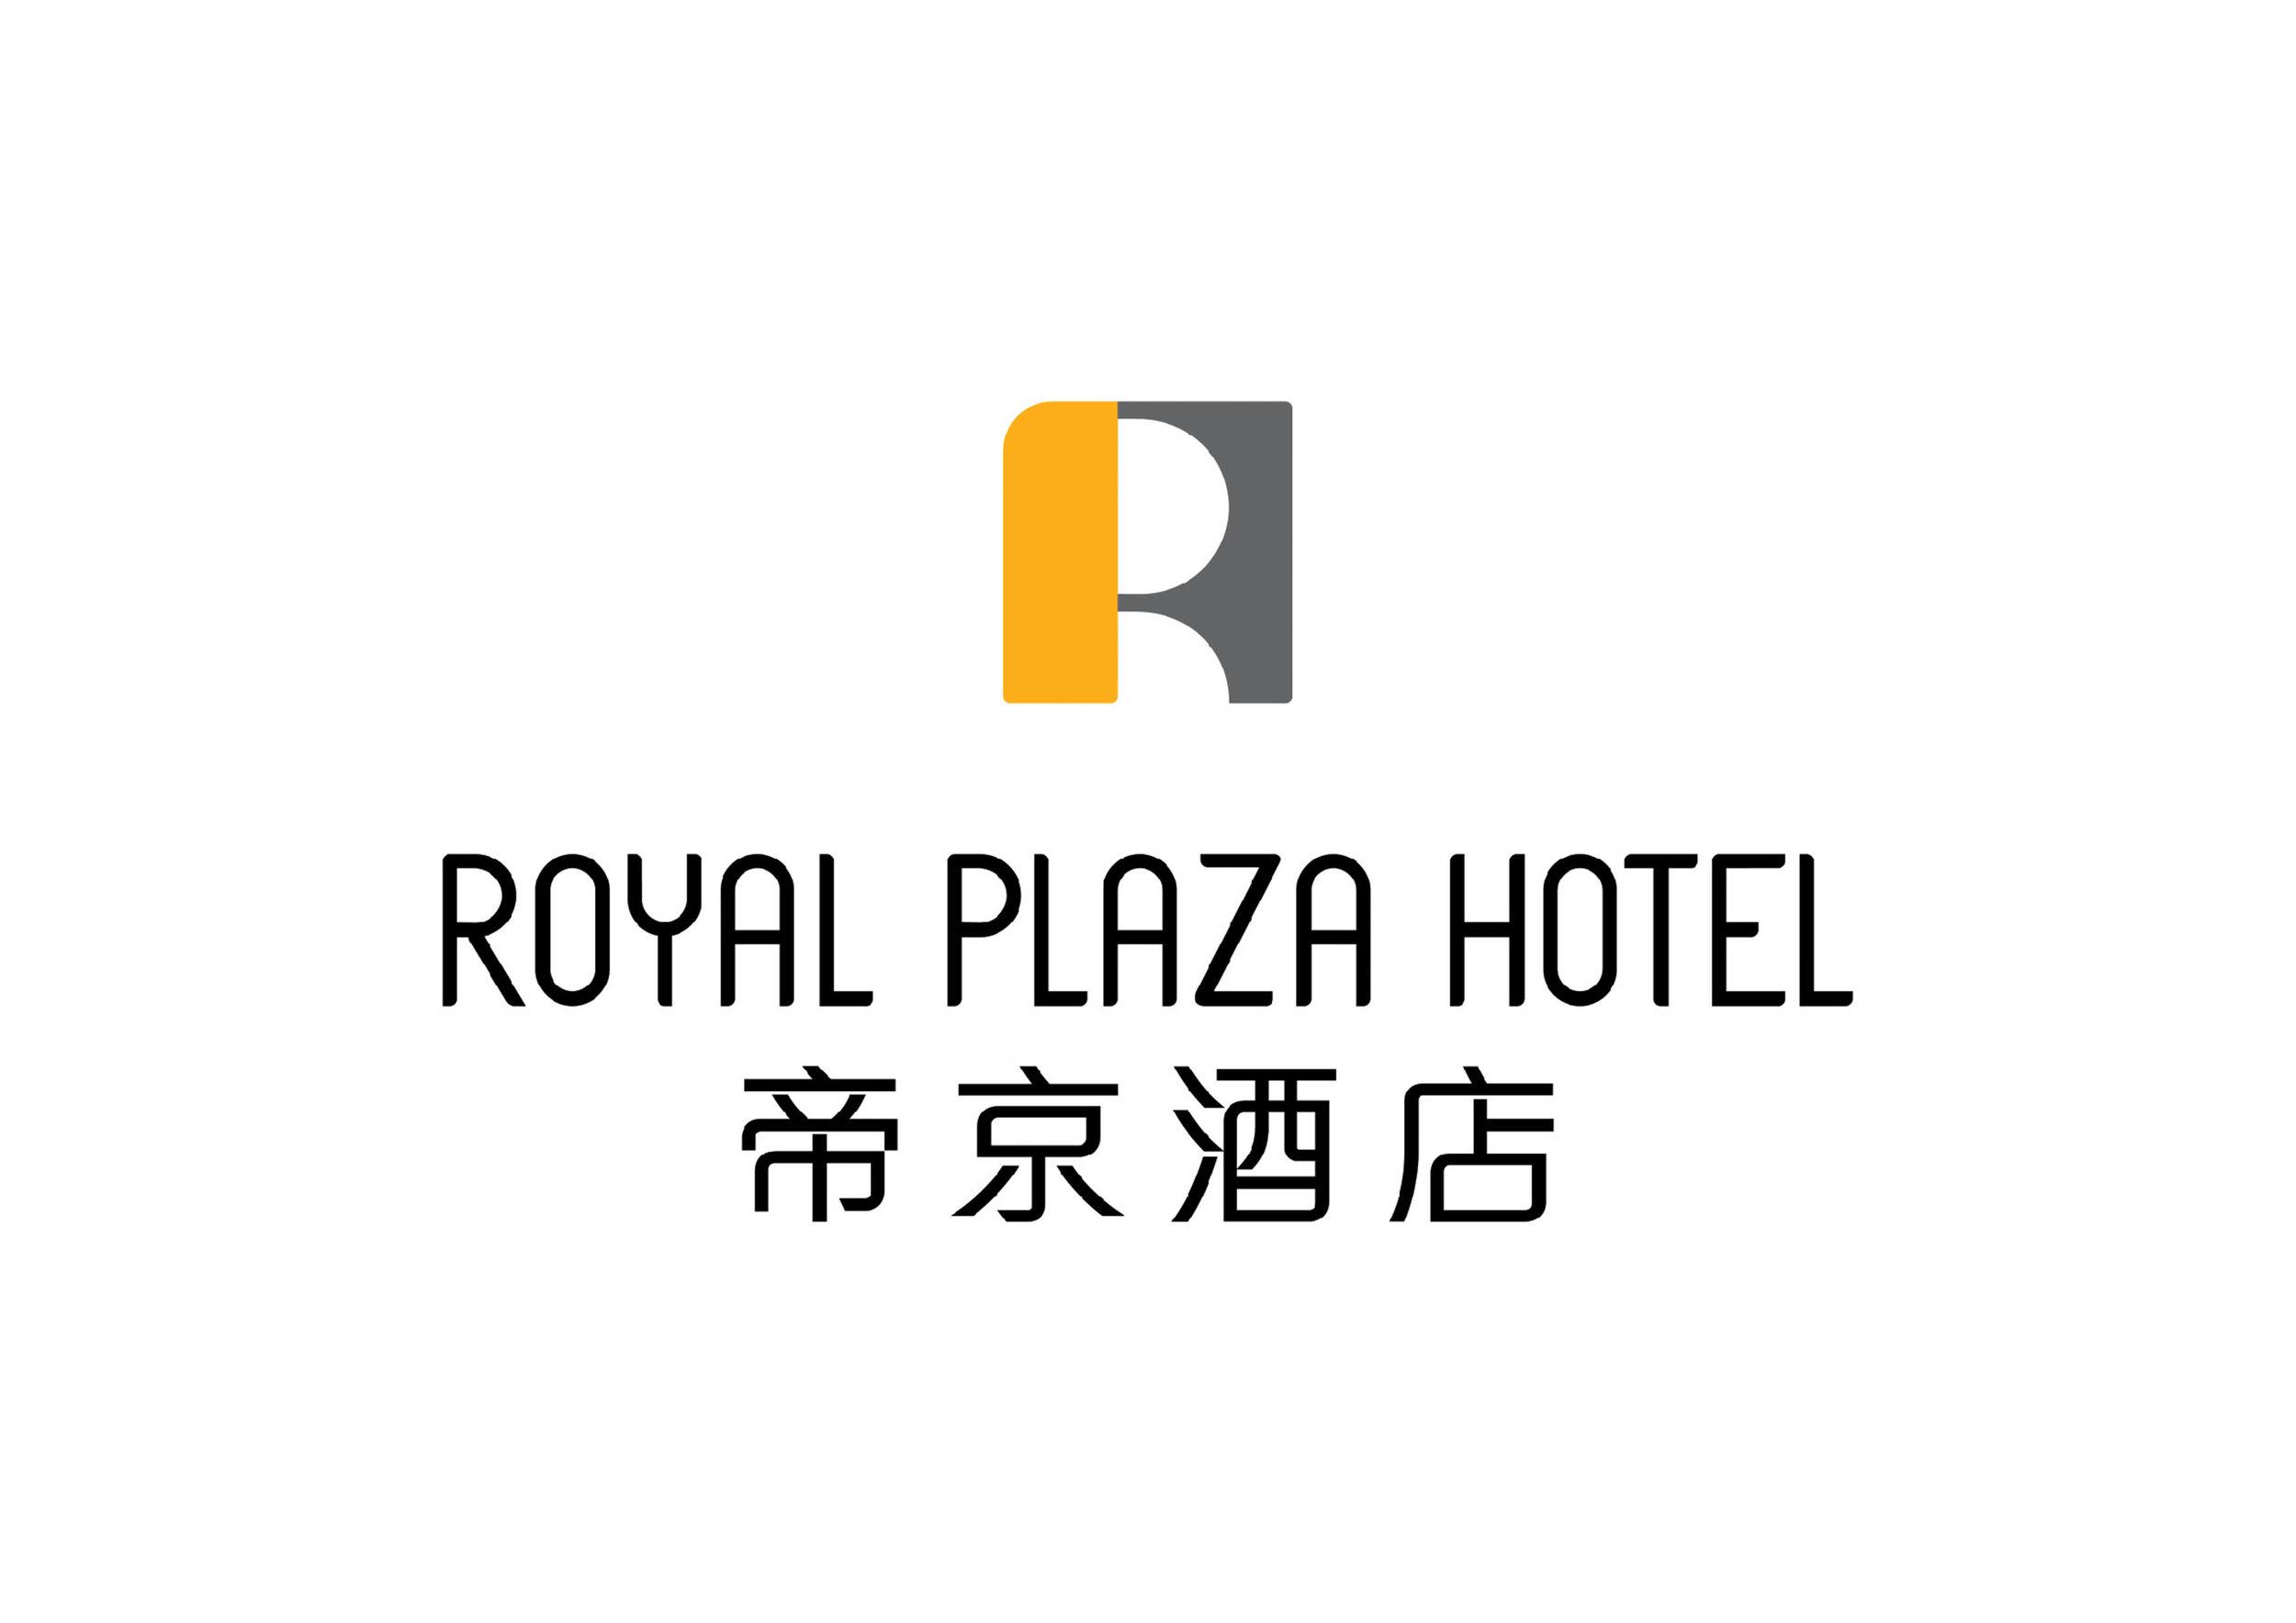 ..  Royal Plaza Hotel